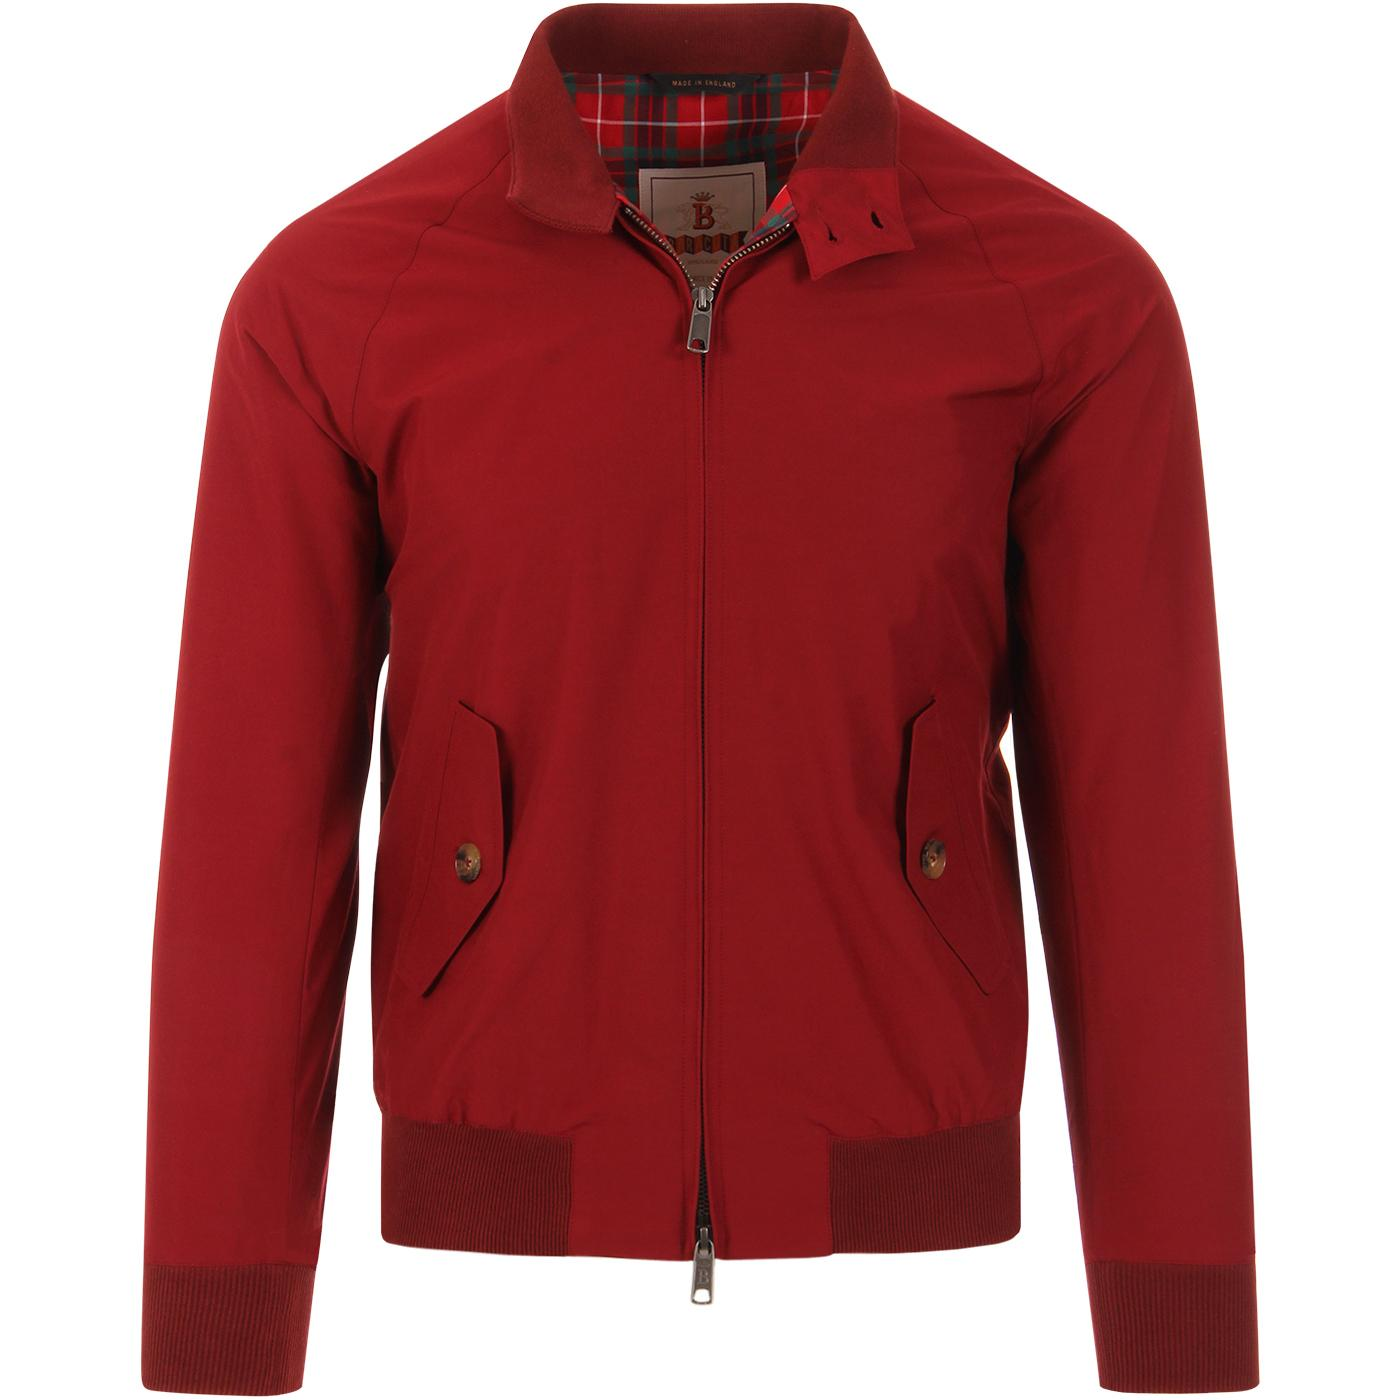 BARACUTA G9 Made in England Harrington (Ruby Red)